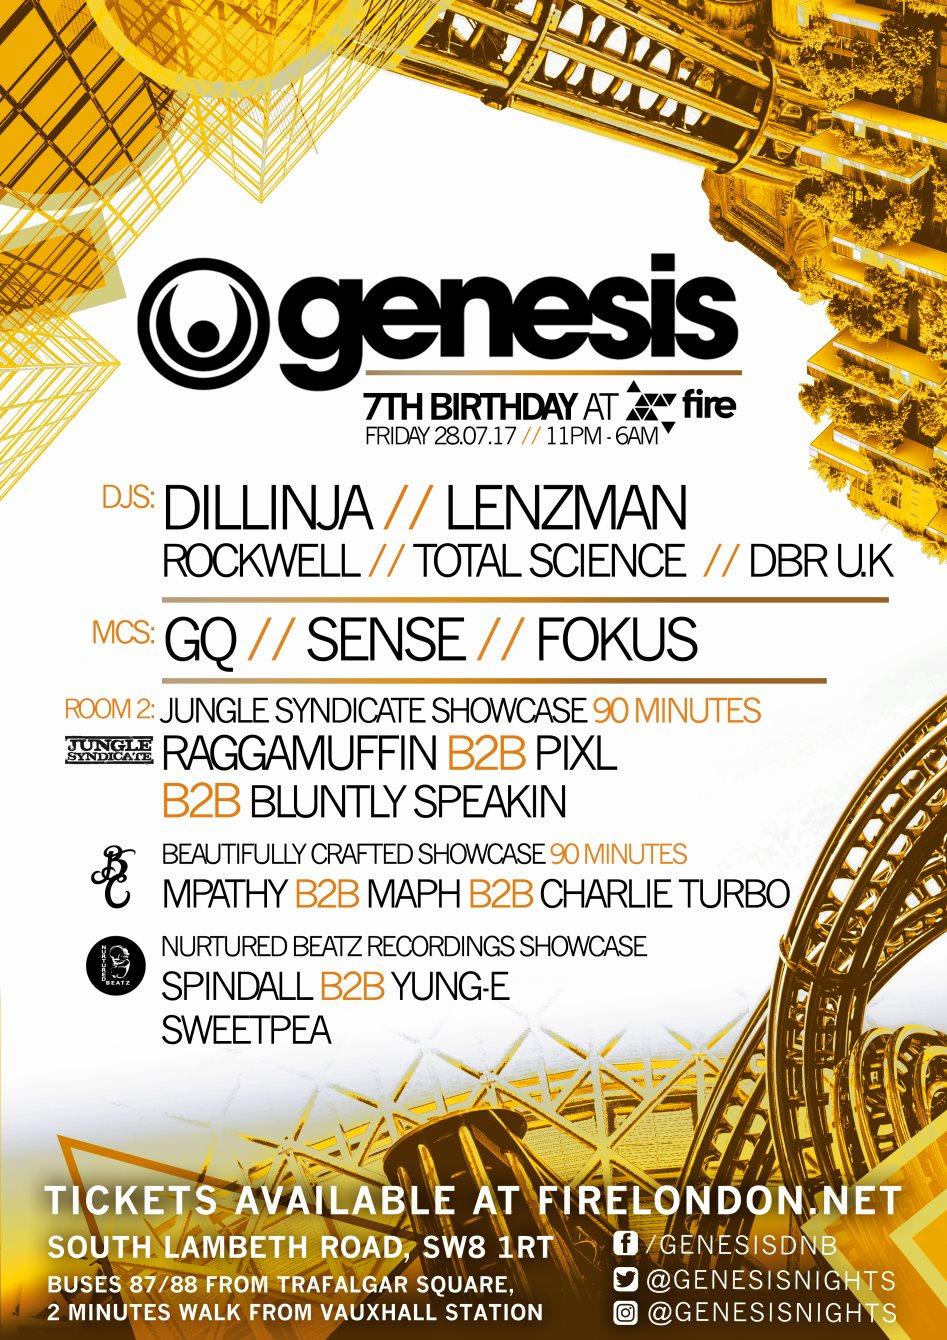 RA: Genesis 7th Birthday with Dillinja, Lenzman, Rockwell